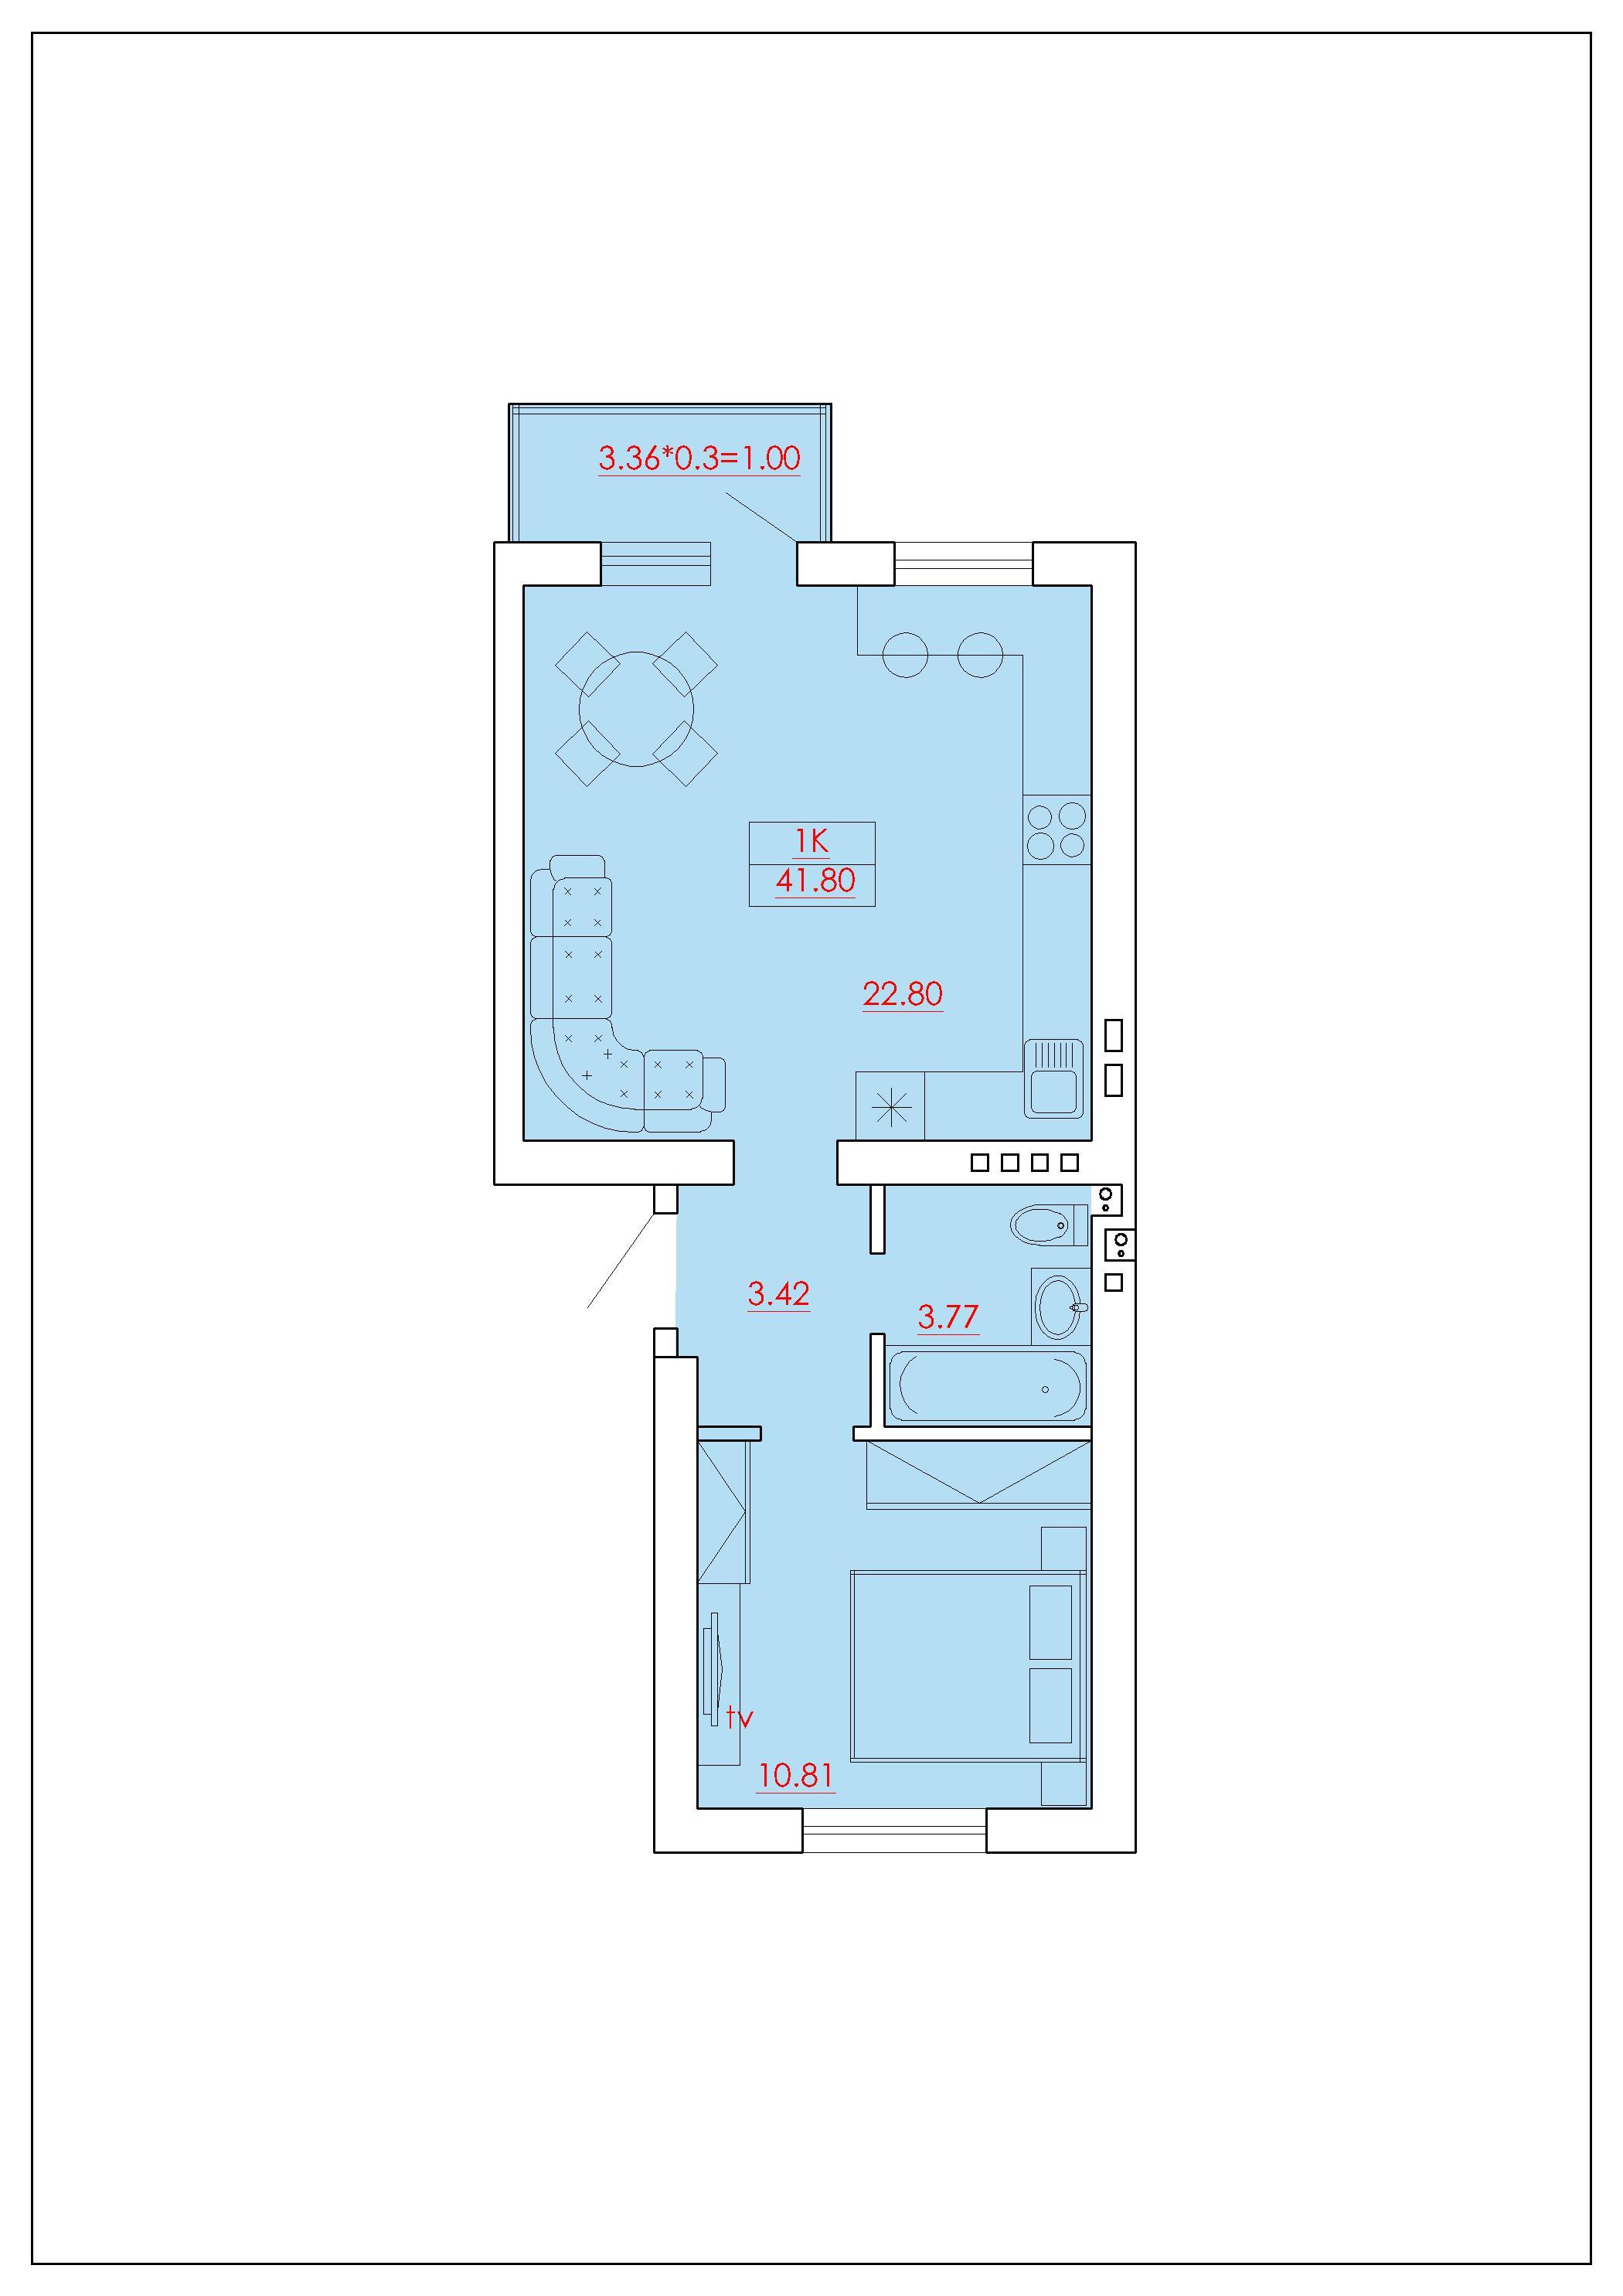 Однокомнатная - ЖК ECO Solaris (Эко Соларис)$26334Площадь:41.8m²